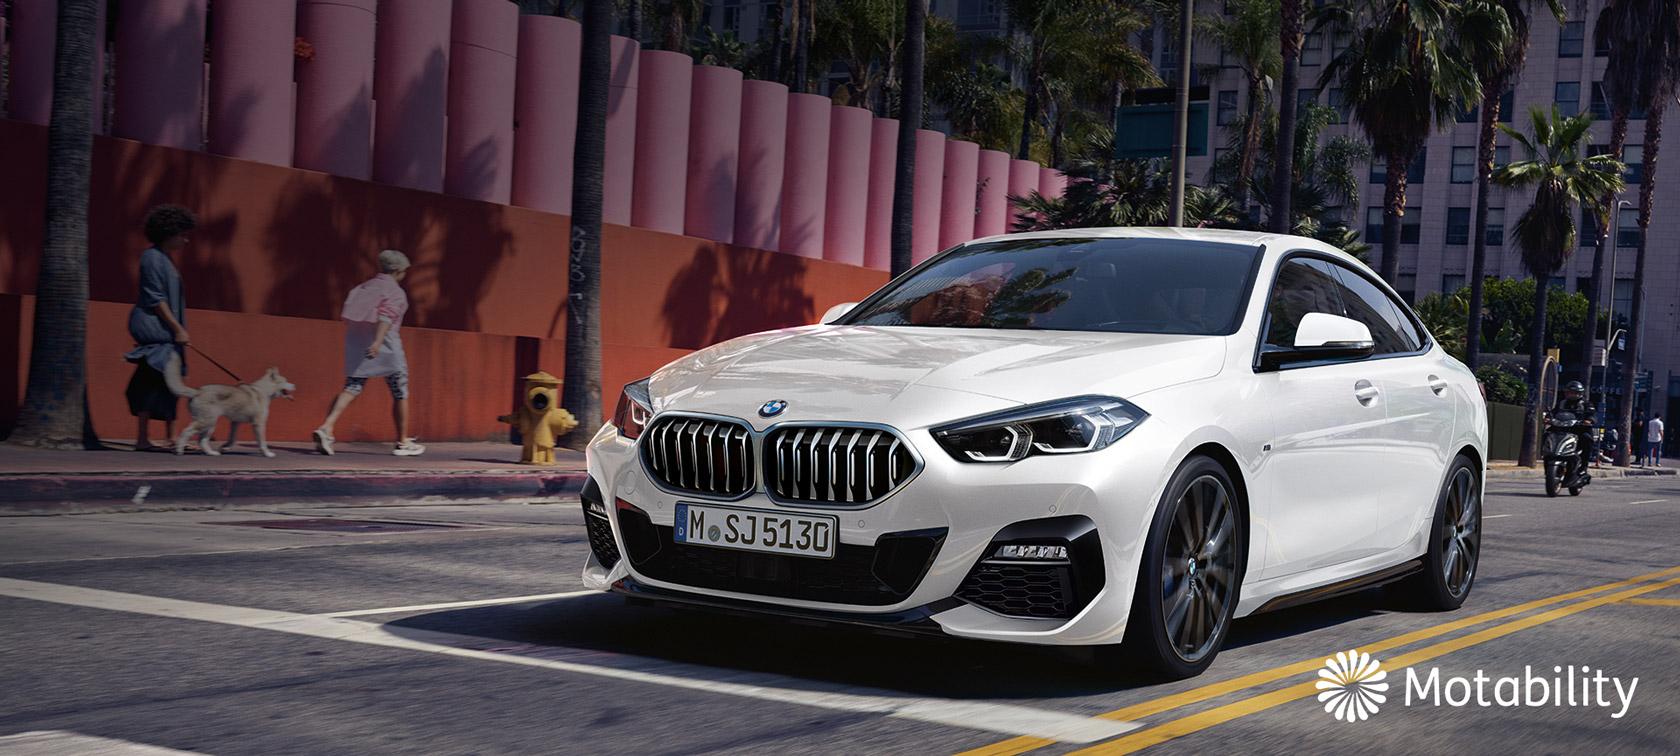 Motability Car Scheme New Cars Bmw Uk